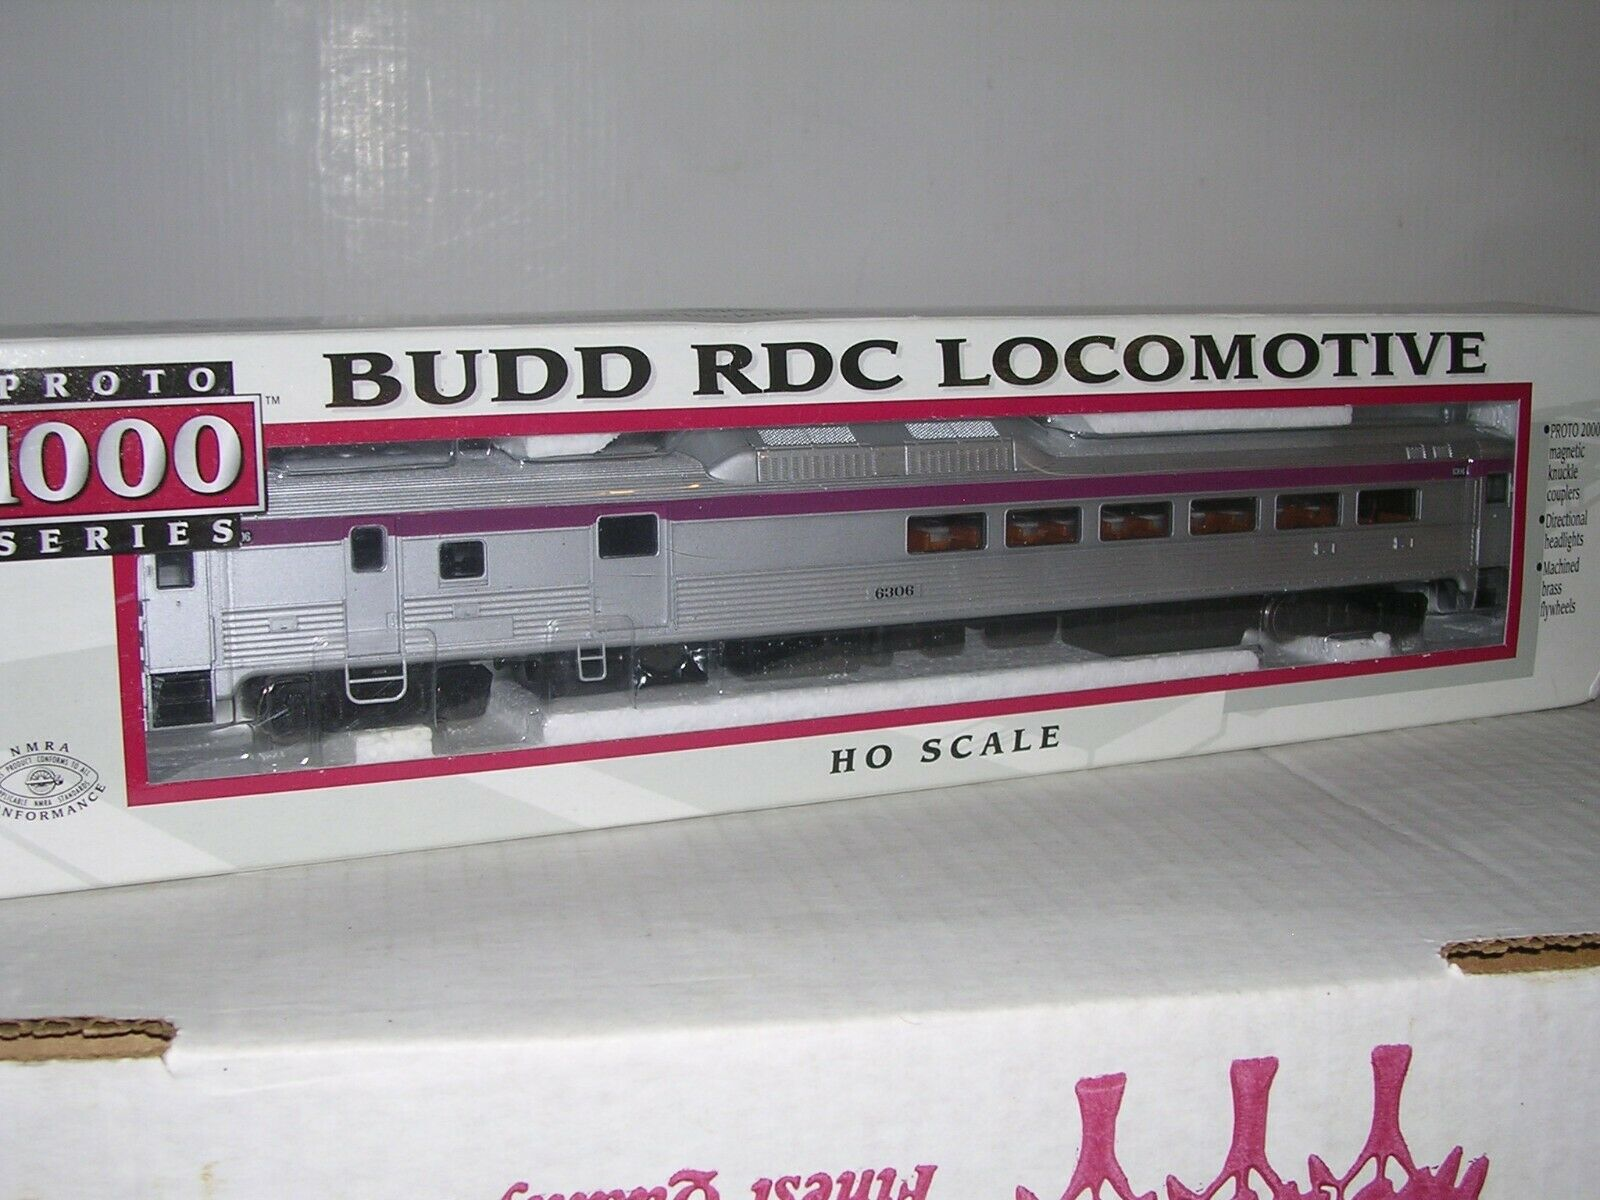 L.L.   p1k 35repas 30394 m.b.t.a.budd RDC - - - 3 diesel orbital Vehicle 6306 h.o.1   87 586